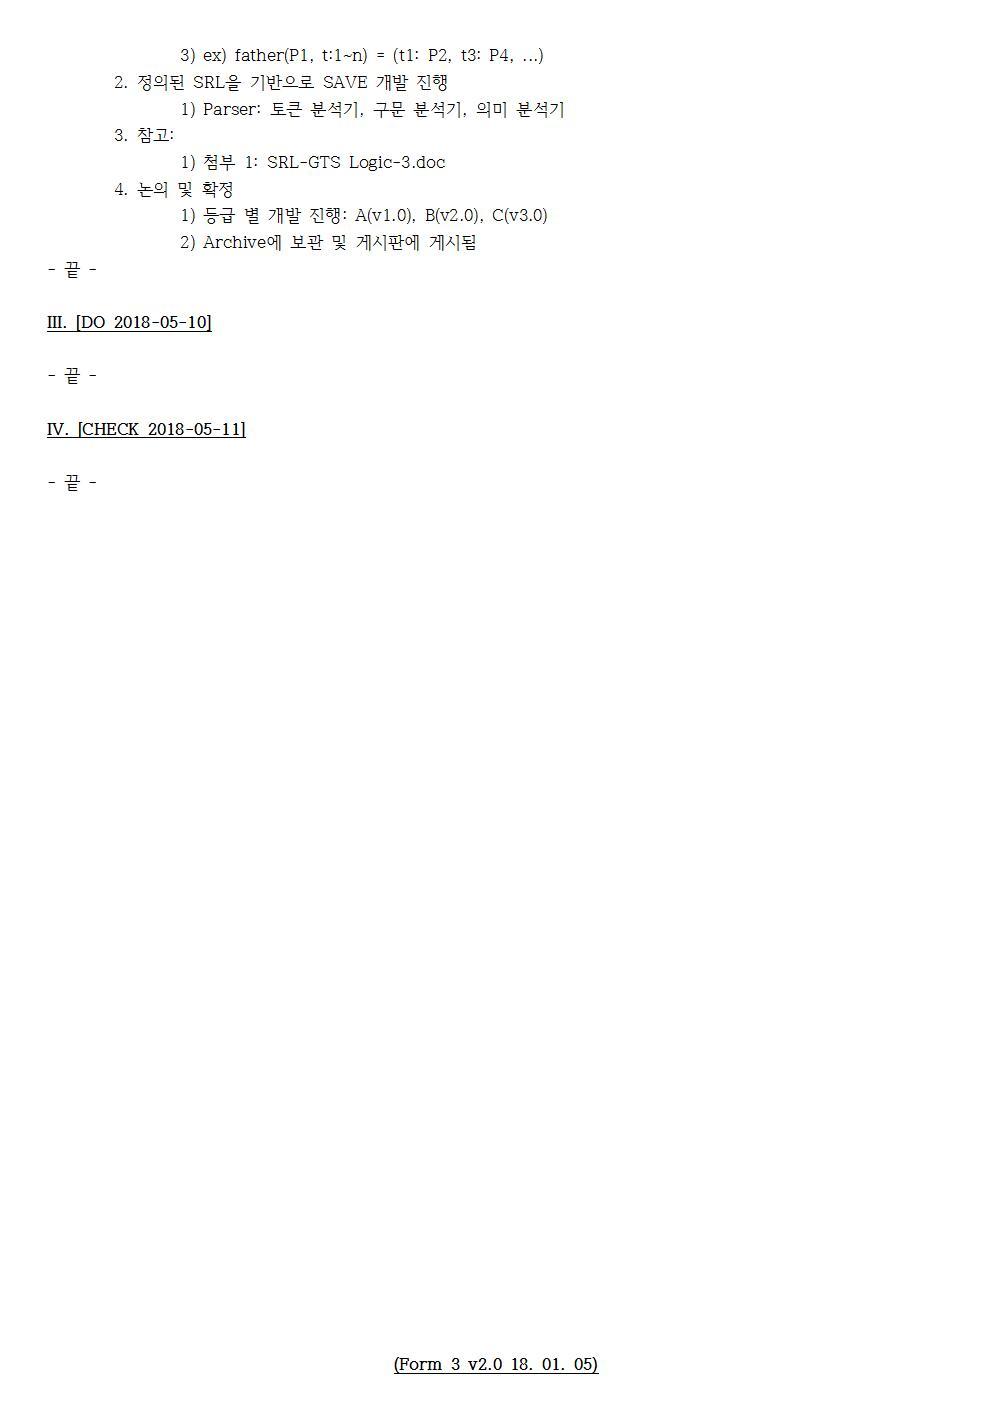 D-[18-001-RD-01]-[SAVE 3.0]-[2018-05-14][SH]002.jpg